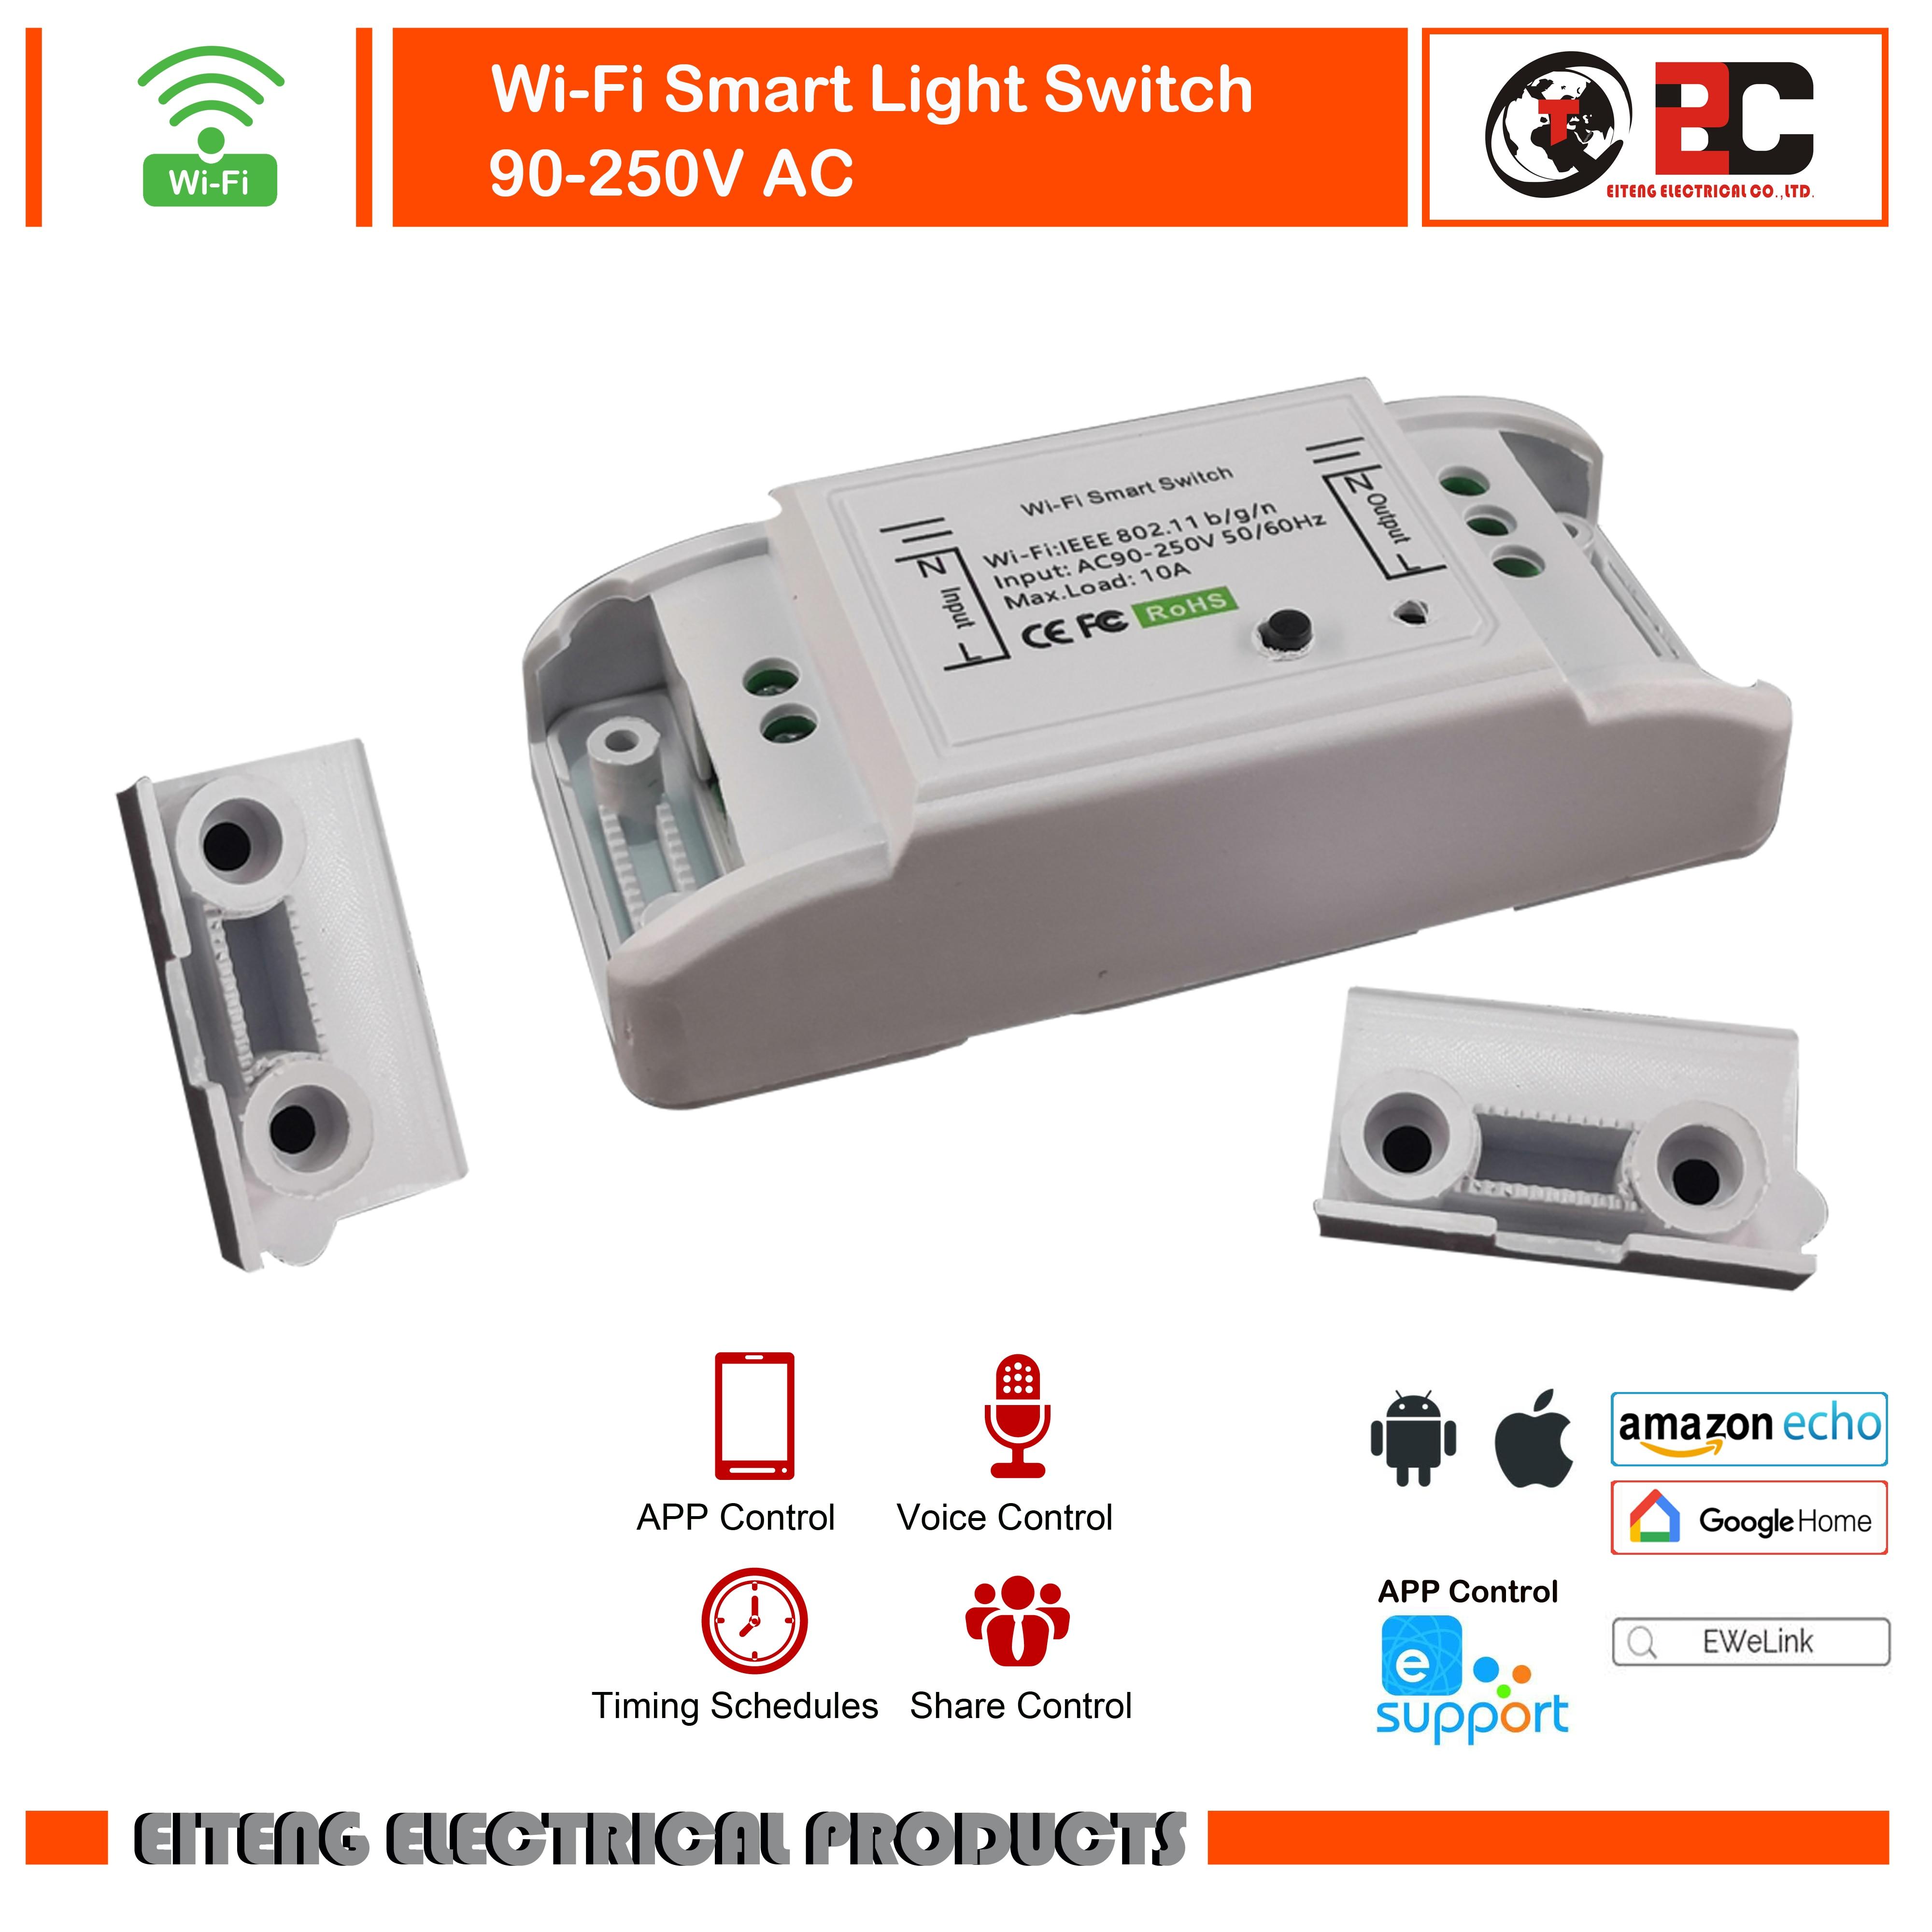 DIY WiFi Smart Light Switch Universal Breaker Timer Smart Life APP Wireless Remote Control Works With Google Home  Alexa